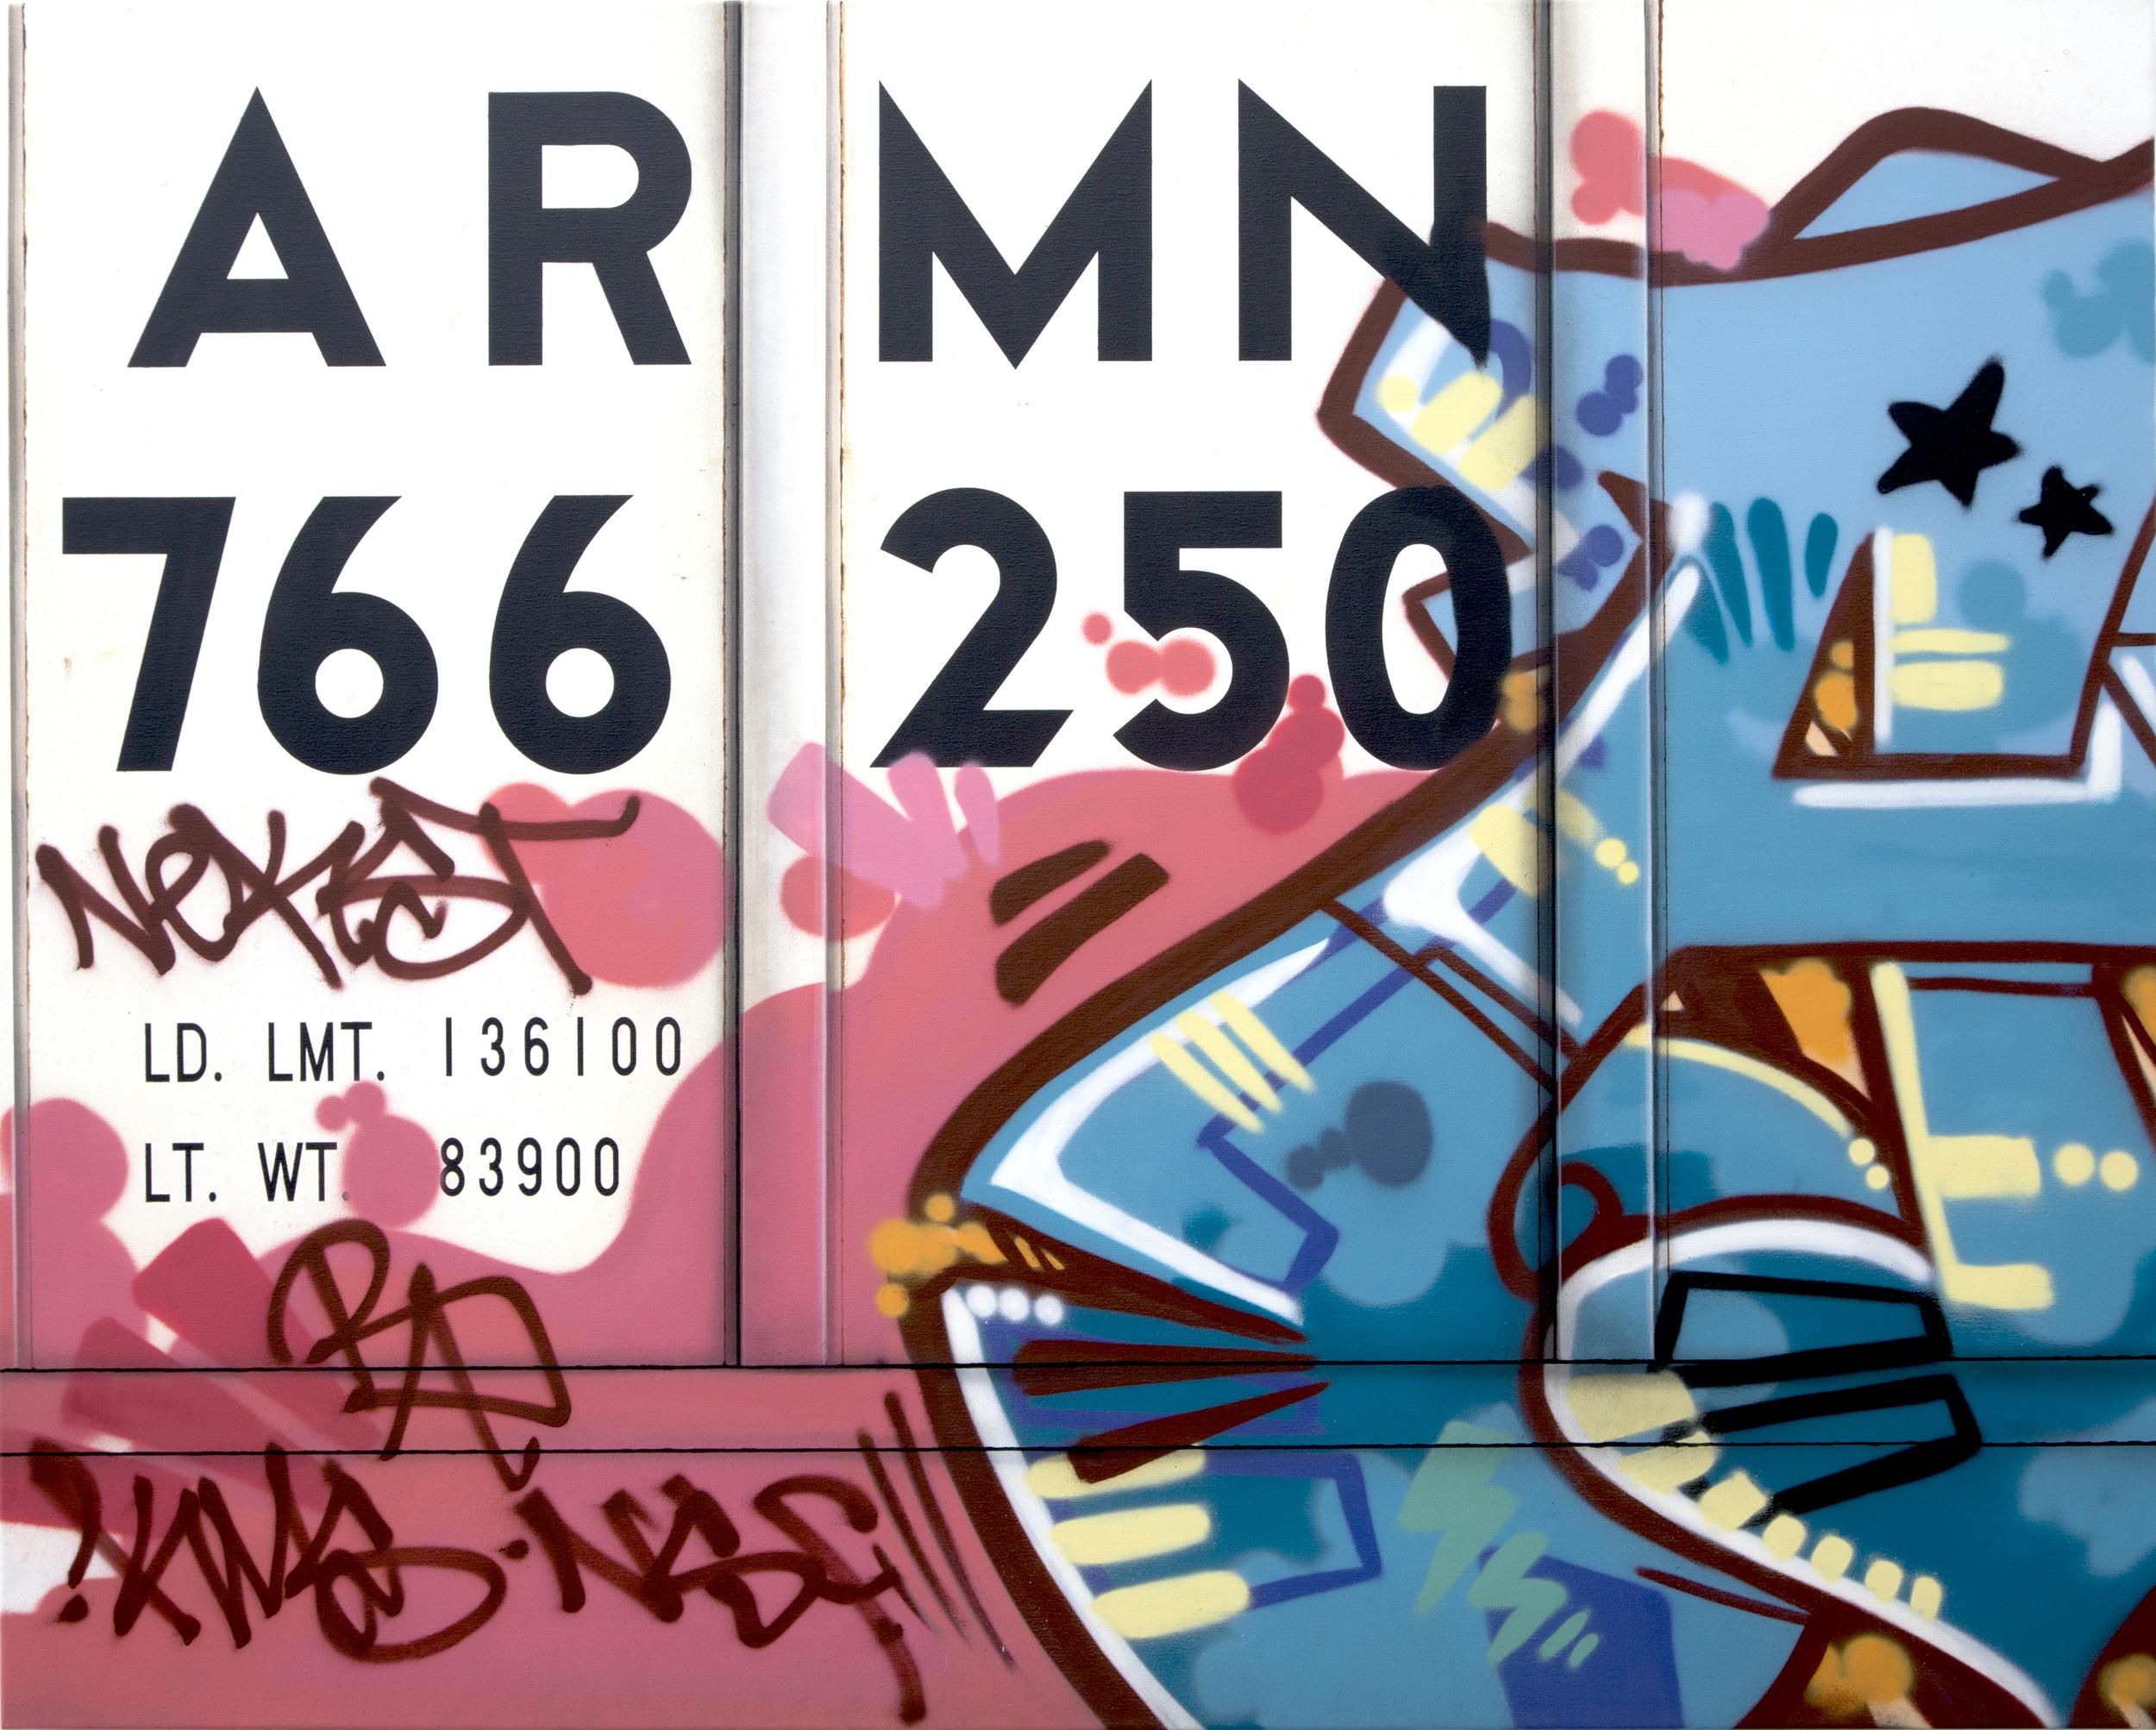 Blank Canvas #42 – ARMN, Freight Train Painting, Boxcar Painting, Railroad Art, Tim Conlon Art